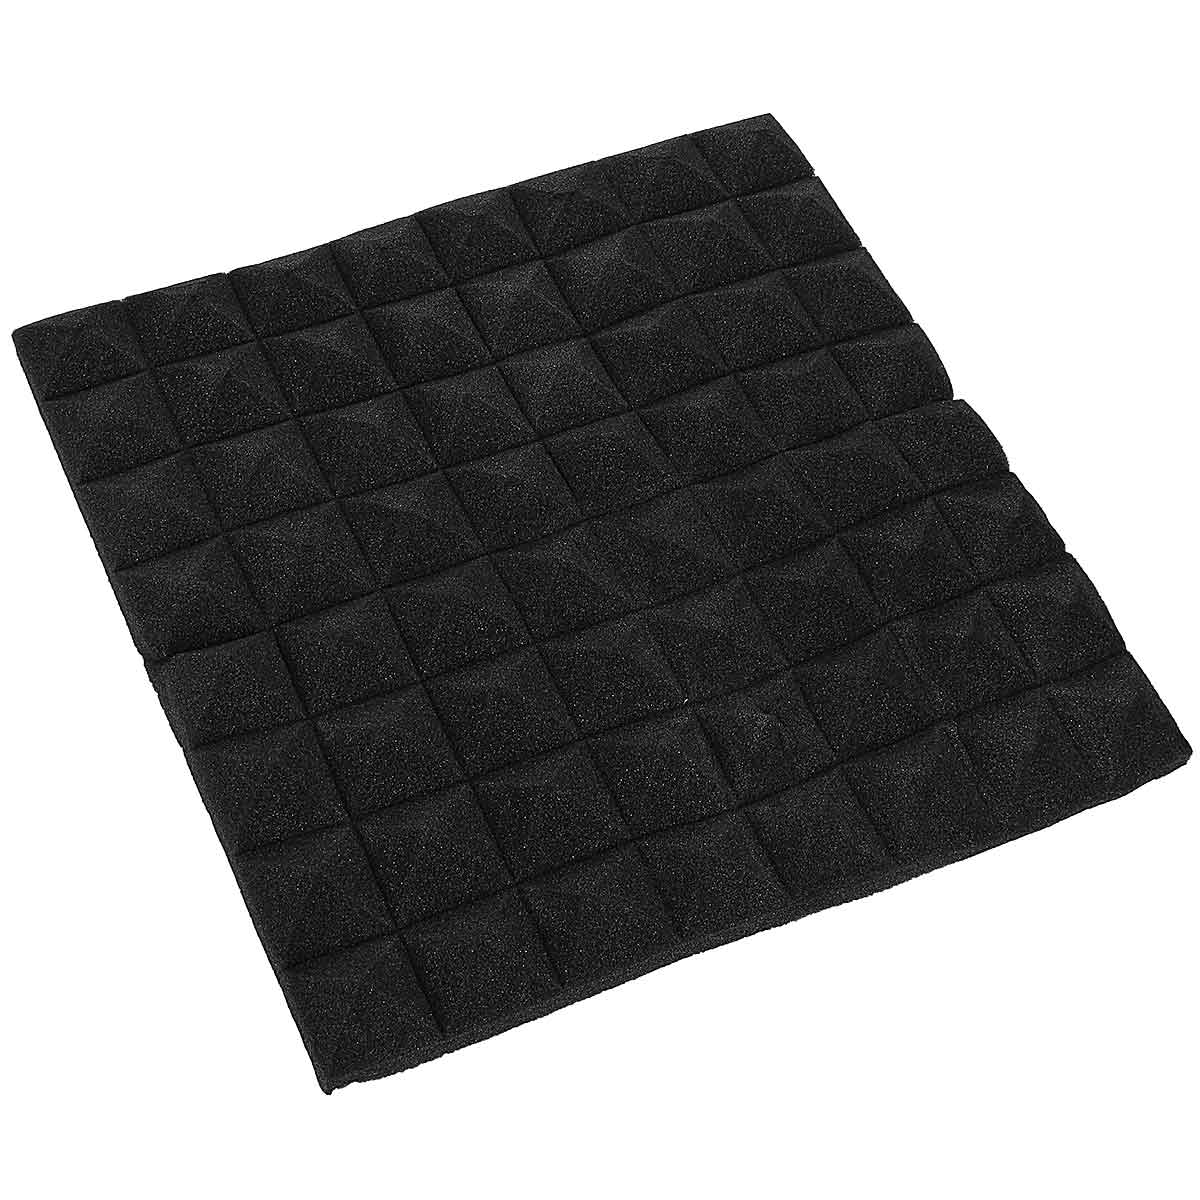 50x50x5cm acoustic soundproof foam sound stop absorption for Soundproof foam